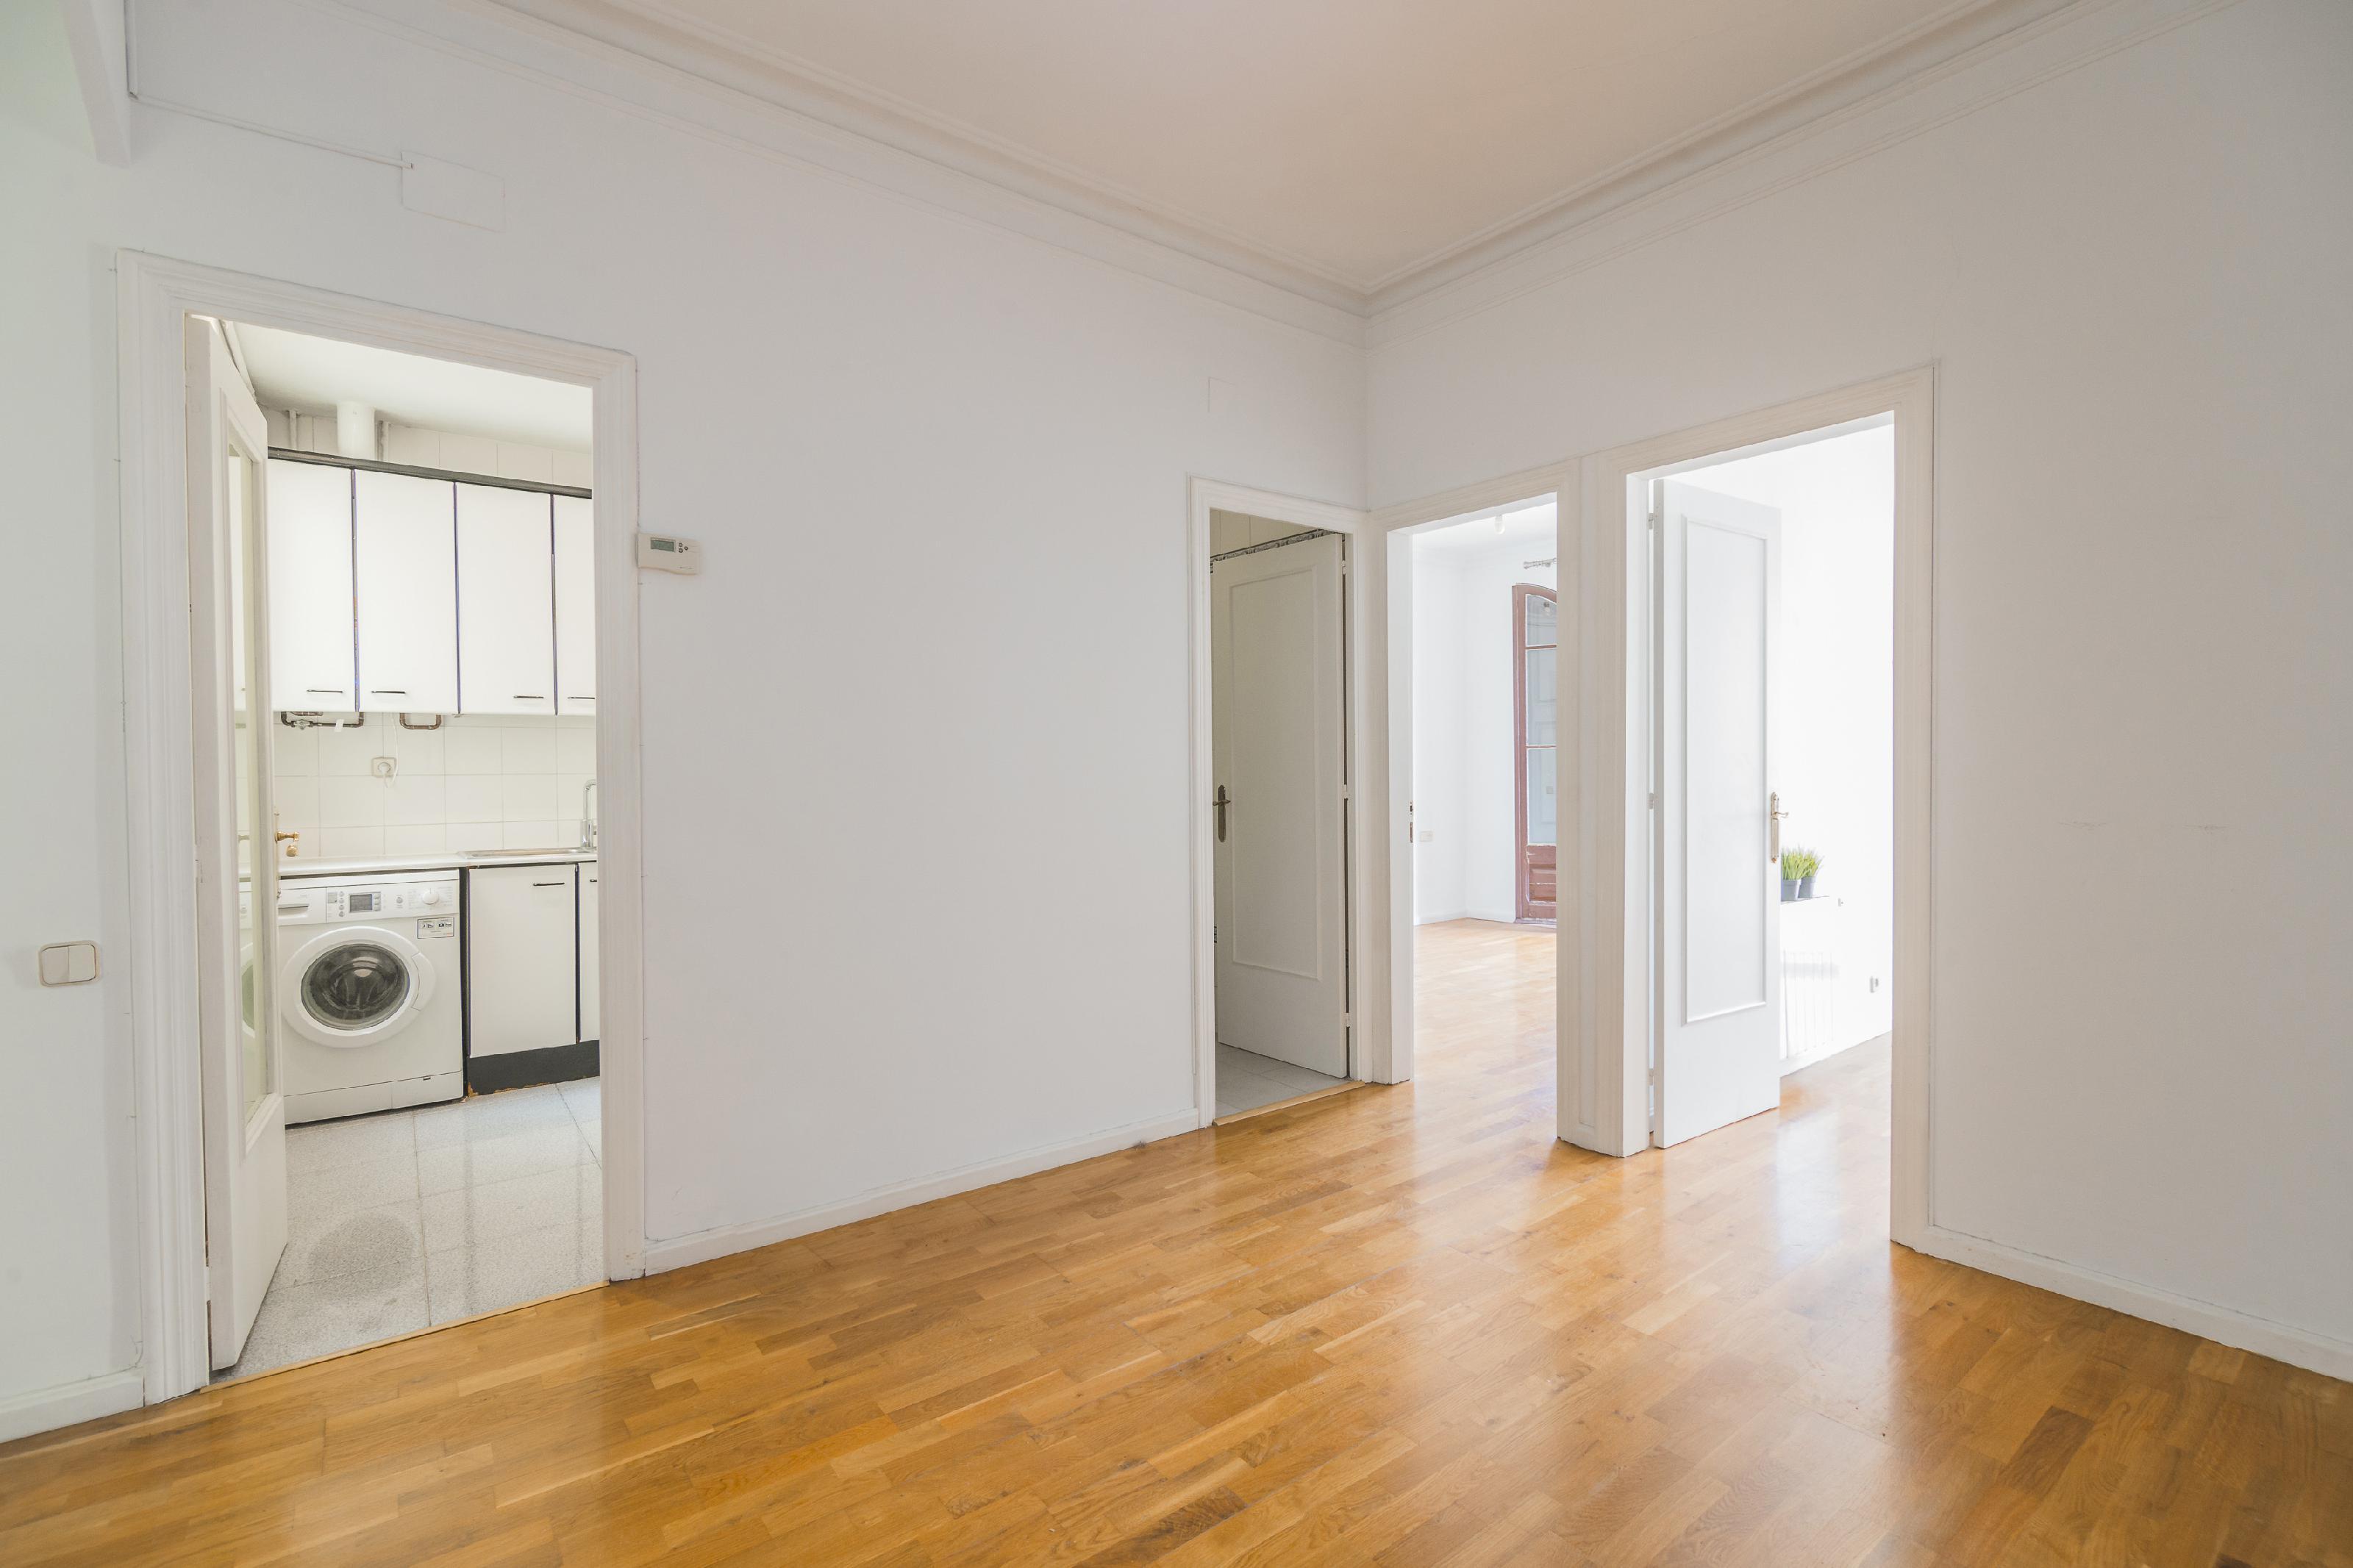 246907 Flat for sale in Eixample, Nova Esquerra Eixample 20